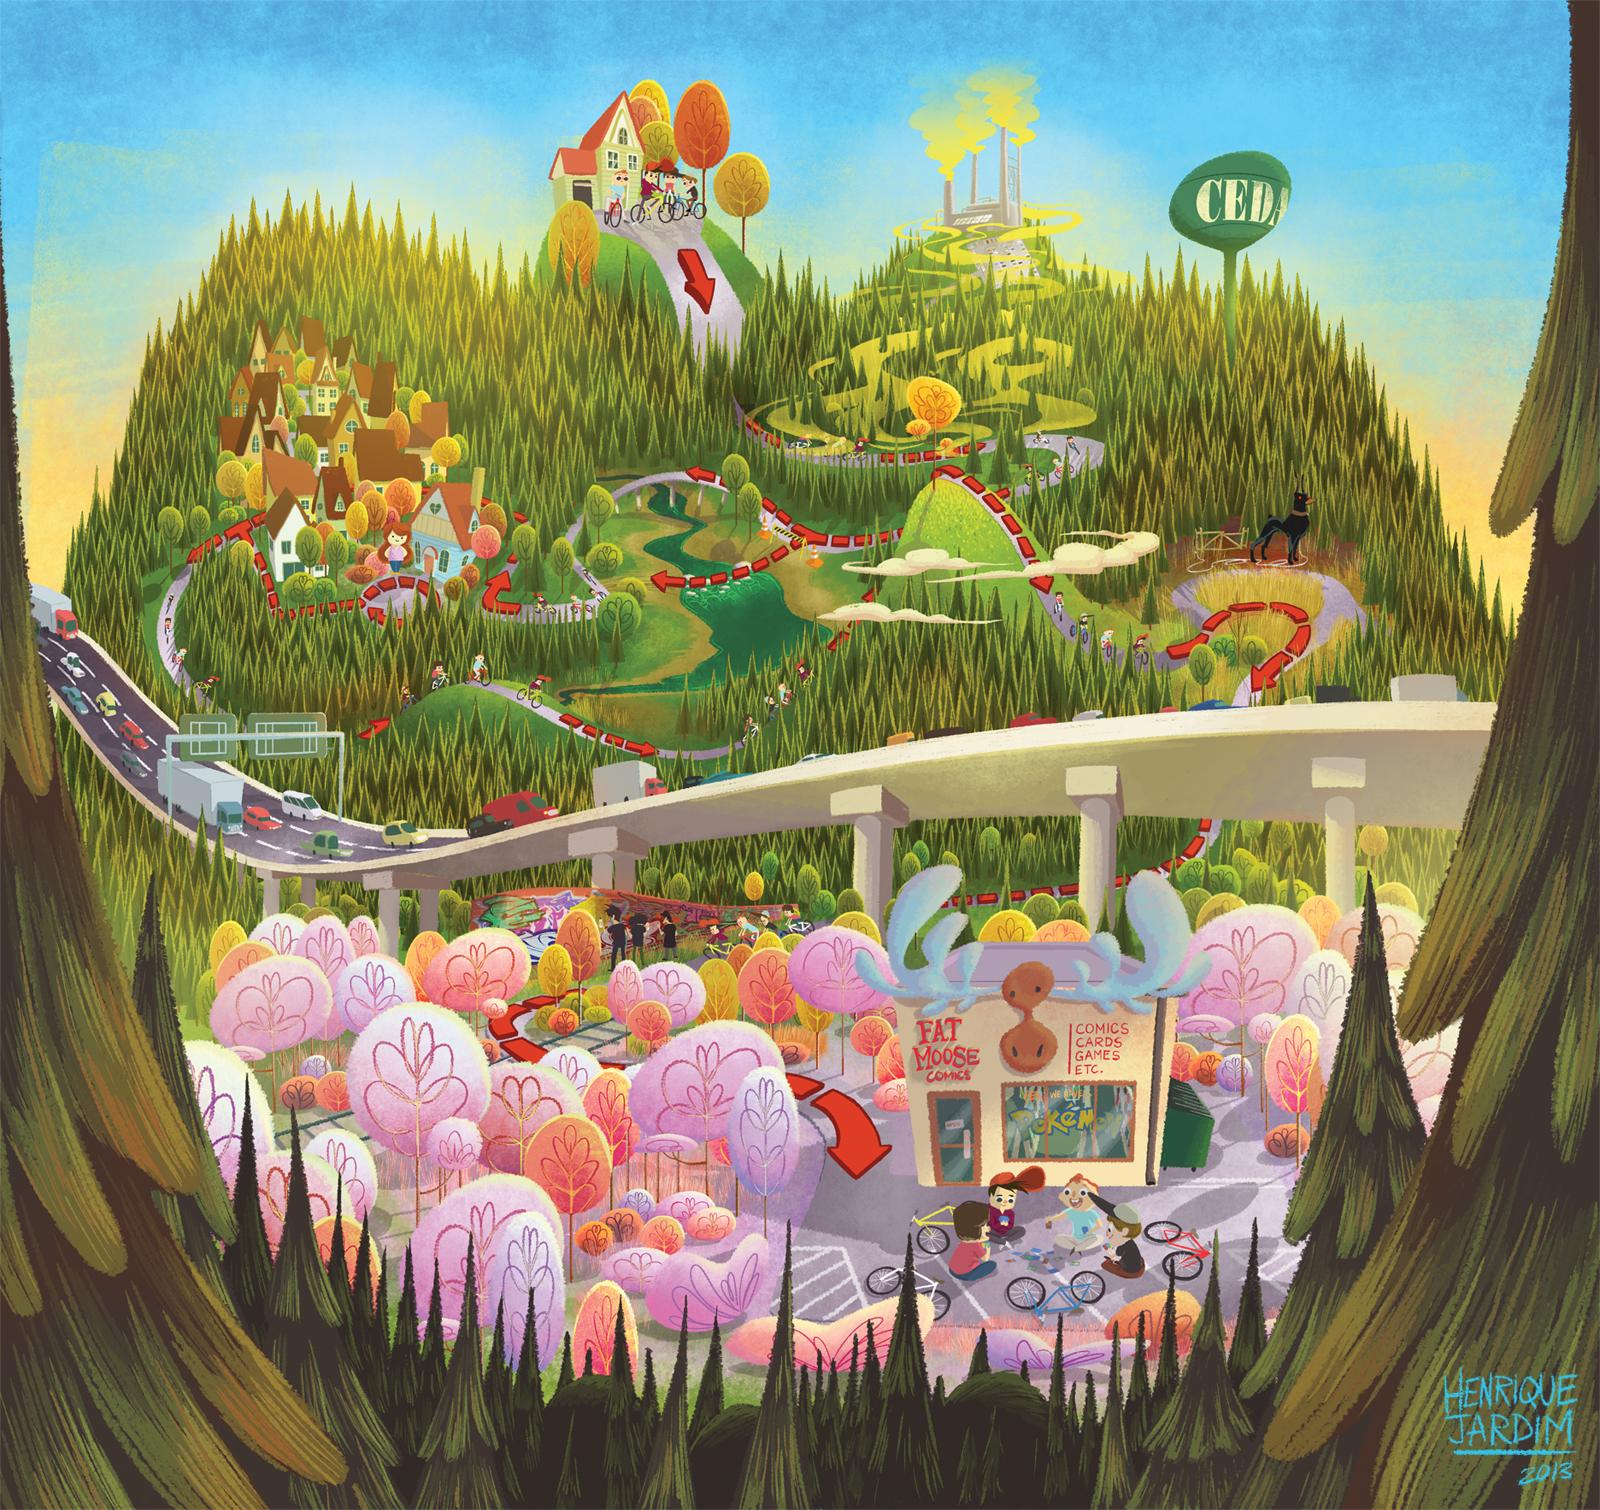 Summer Plans, year 2000